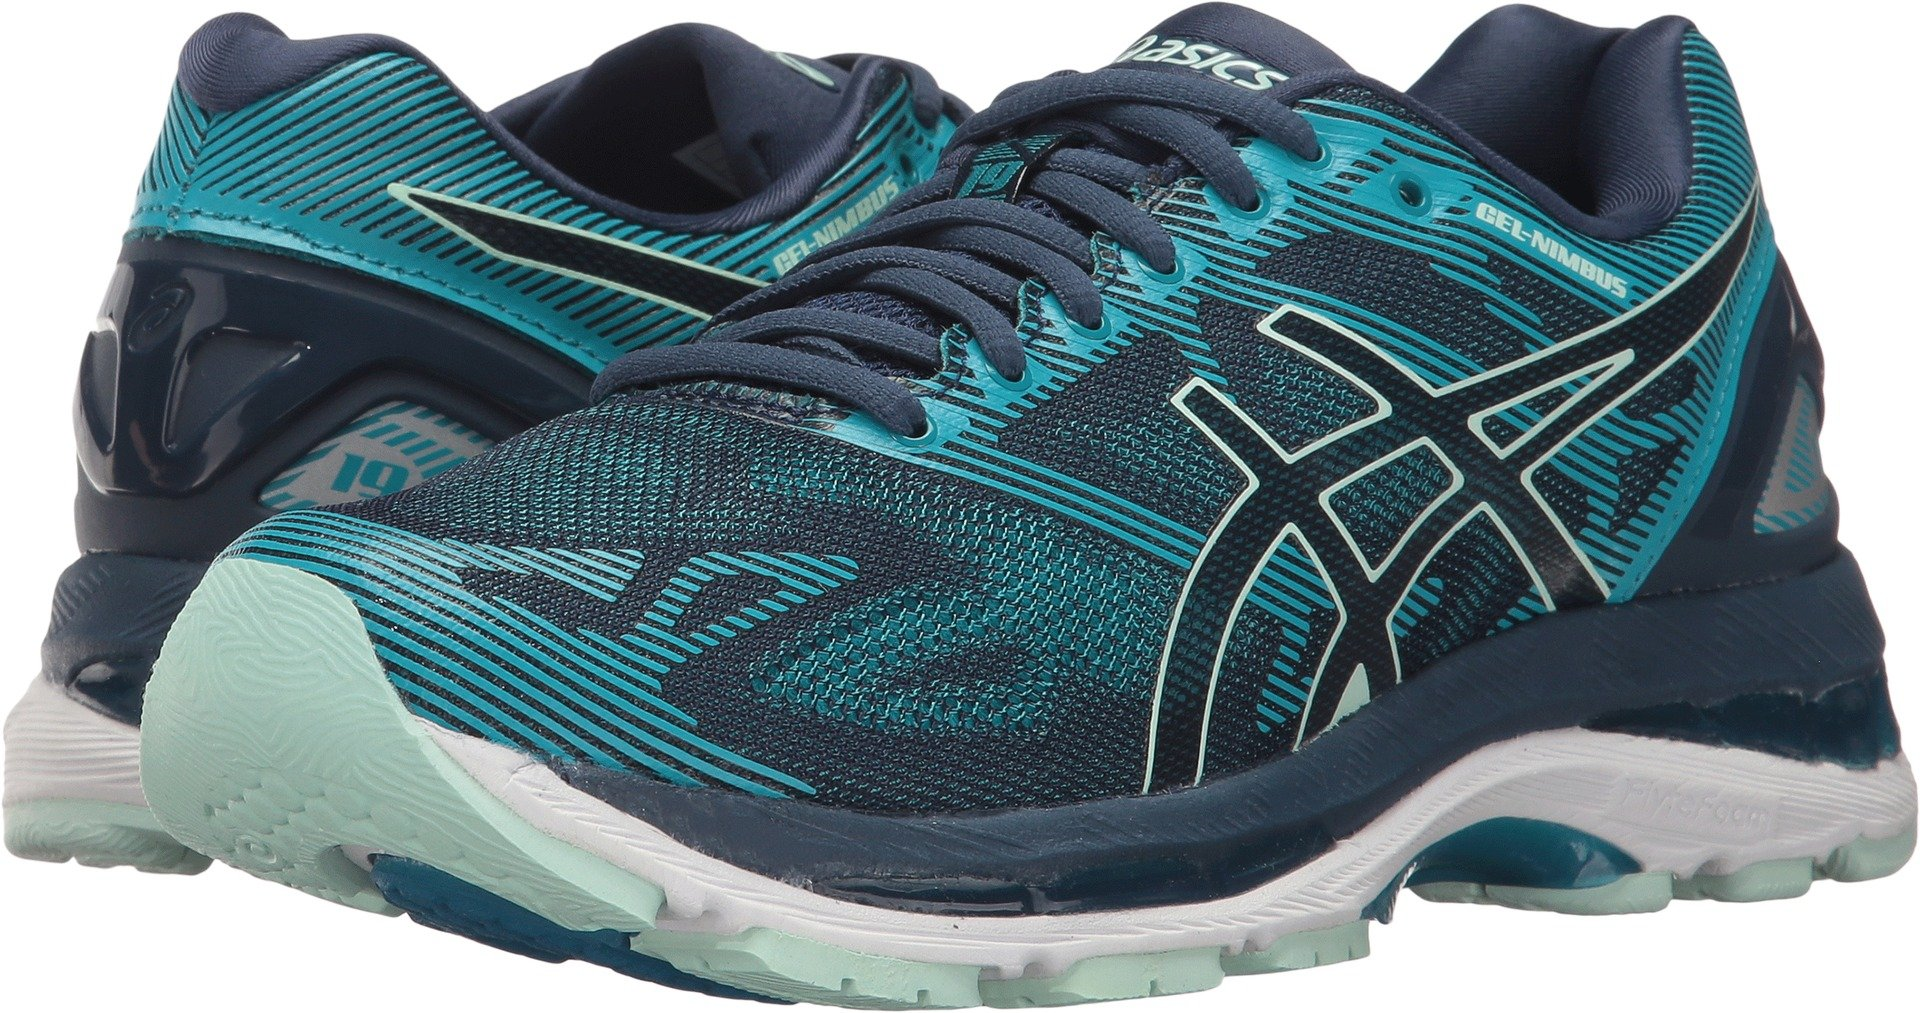 ASICS Women's Gel-Nimbus 19 Running Shoe, Insignia Blue/Glacier Sea/Crystal Blue, 7.5 Medium US